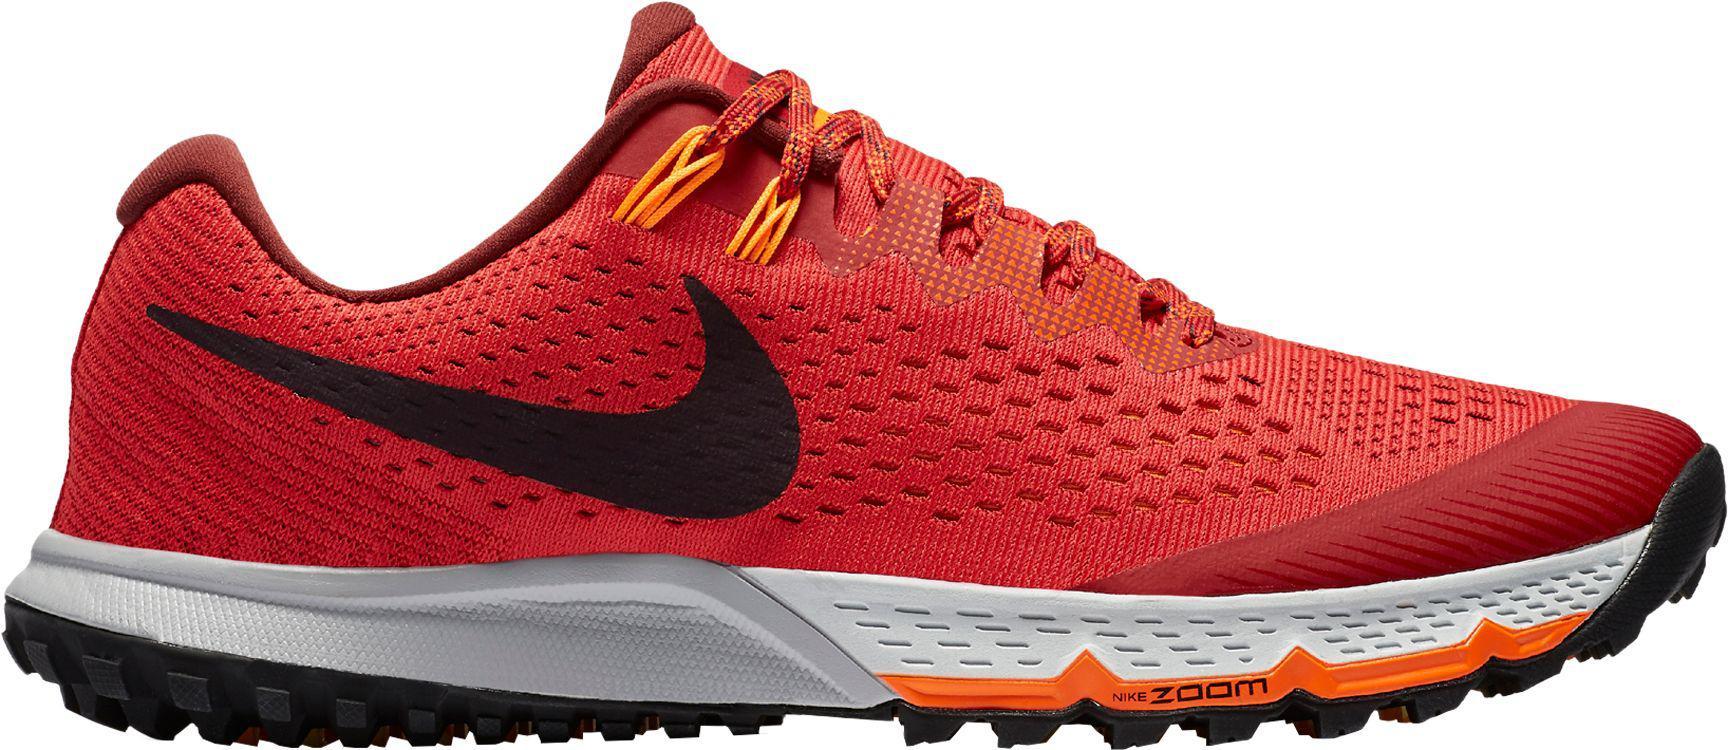 buy online cdac1 961cf Men's Red Air Zoom Terra Kiger 4 Trail Running Shoes